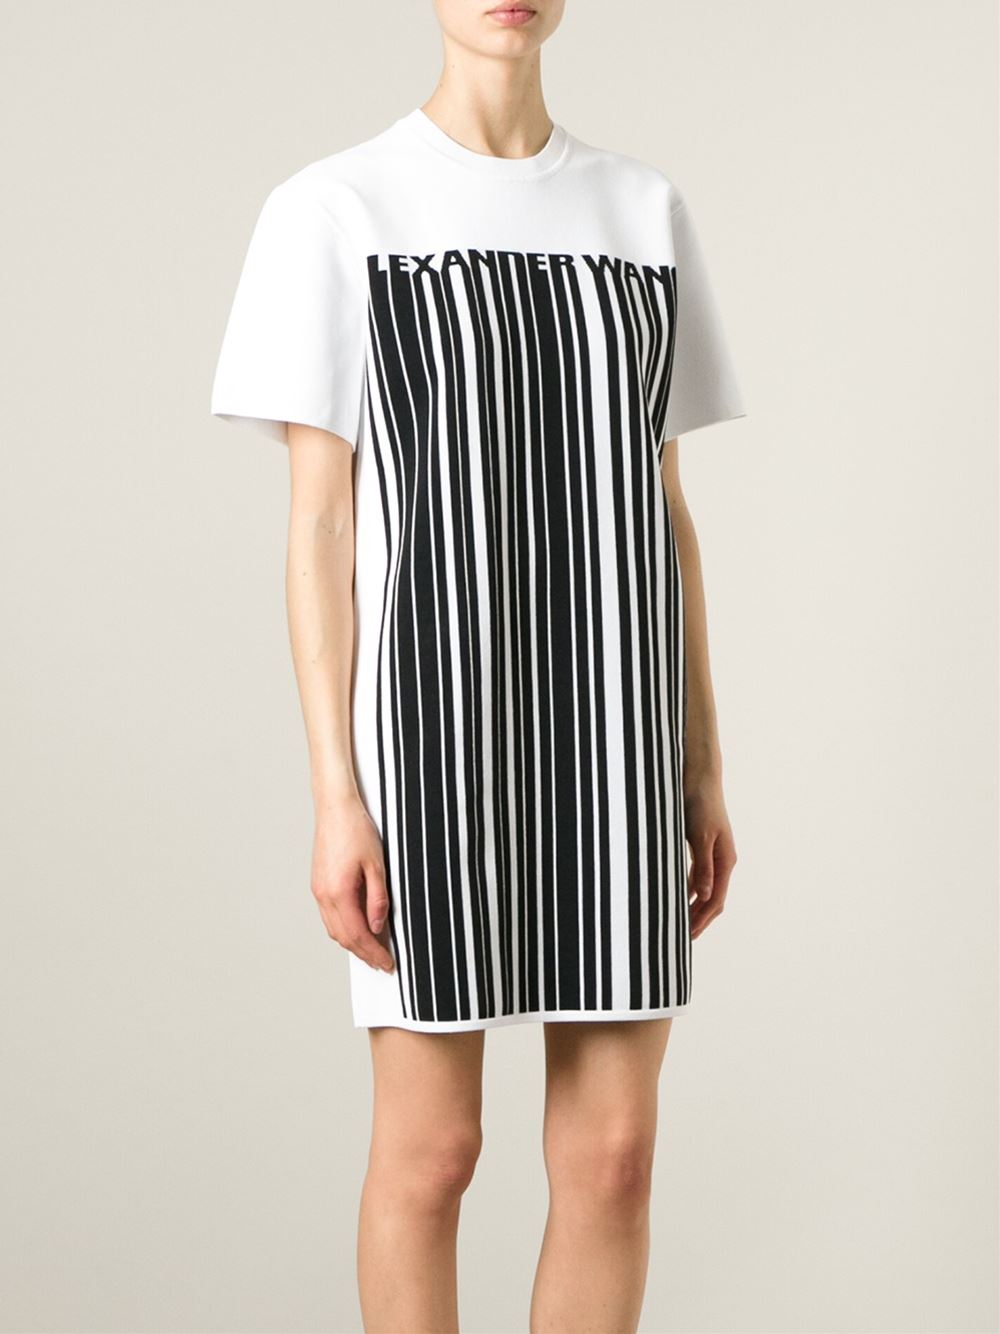 Alexander wang barcode logo t shirt dress in black white for Logo t shirt dress